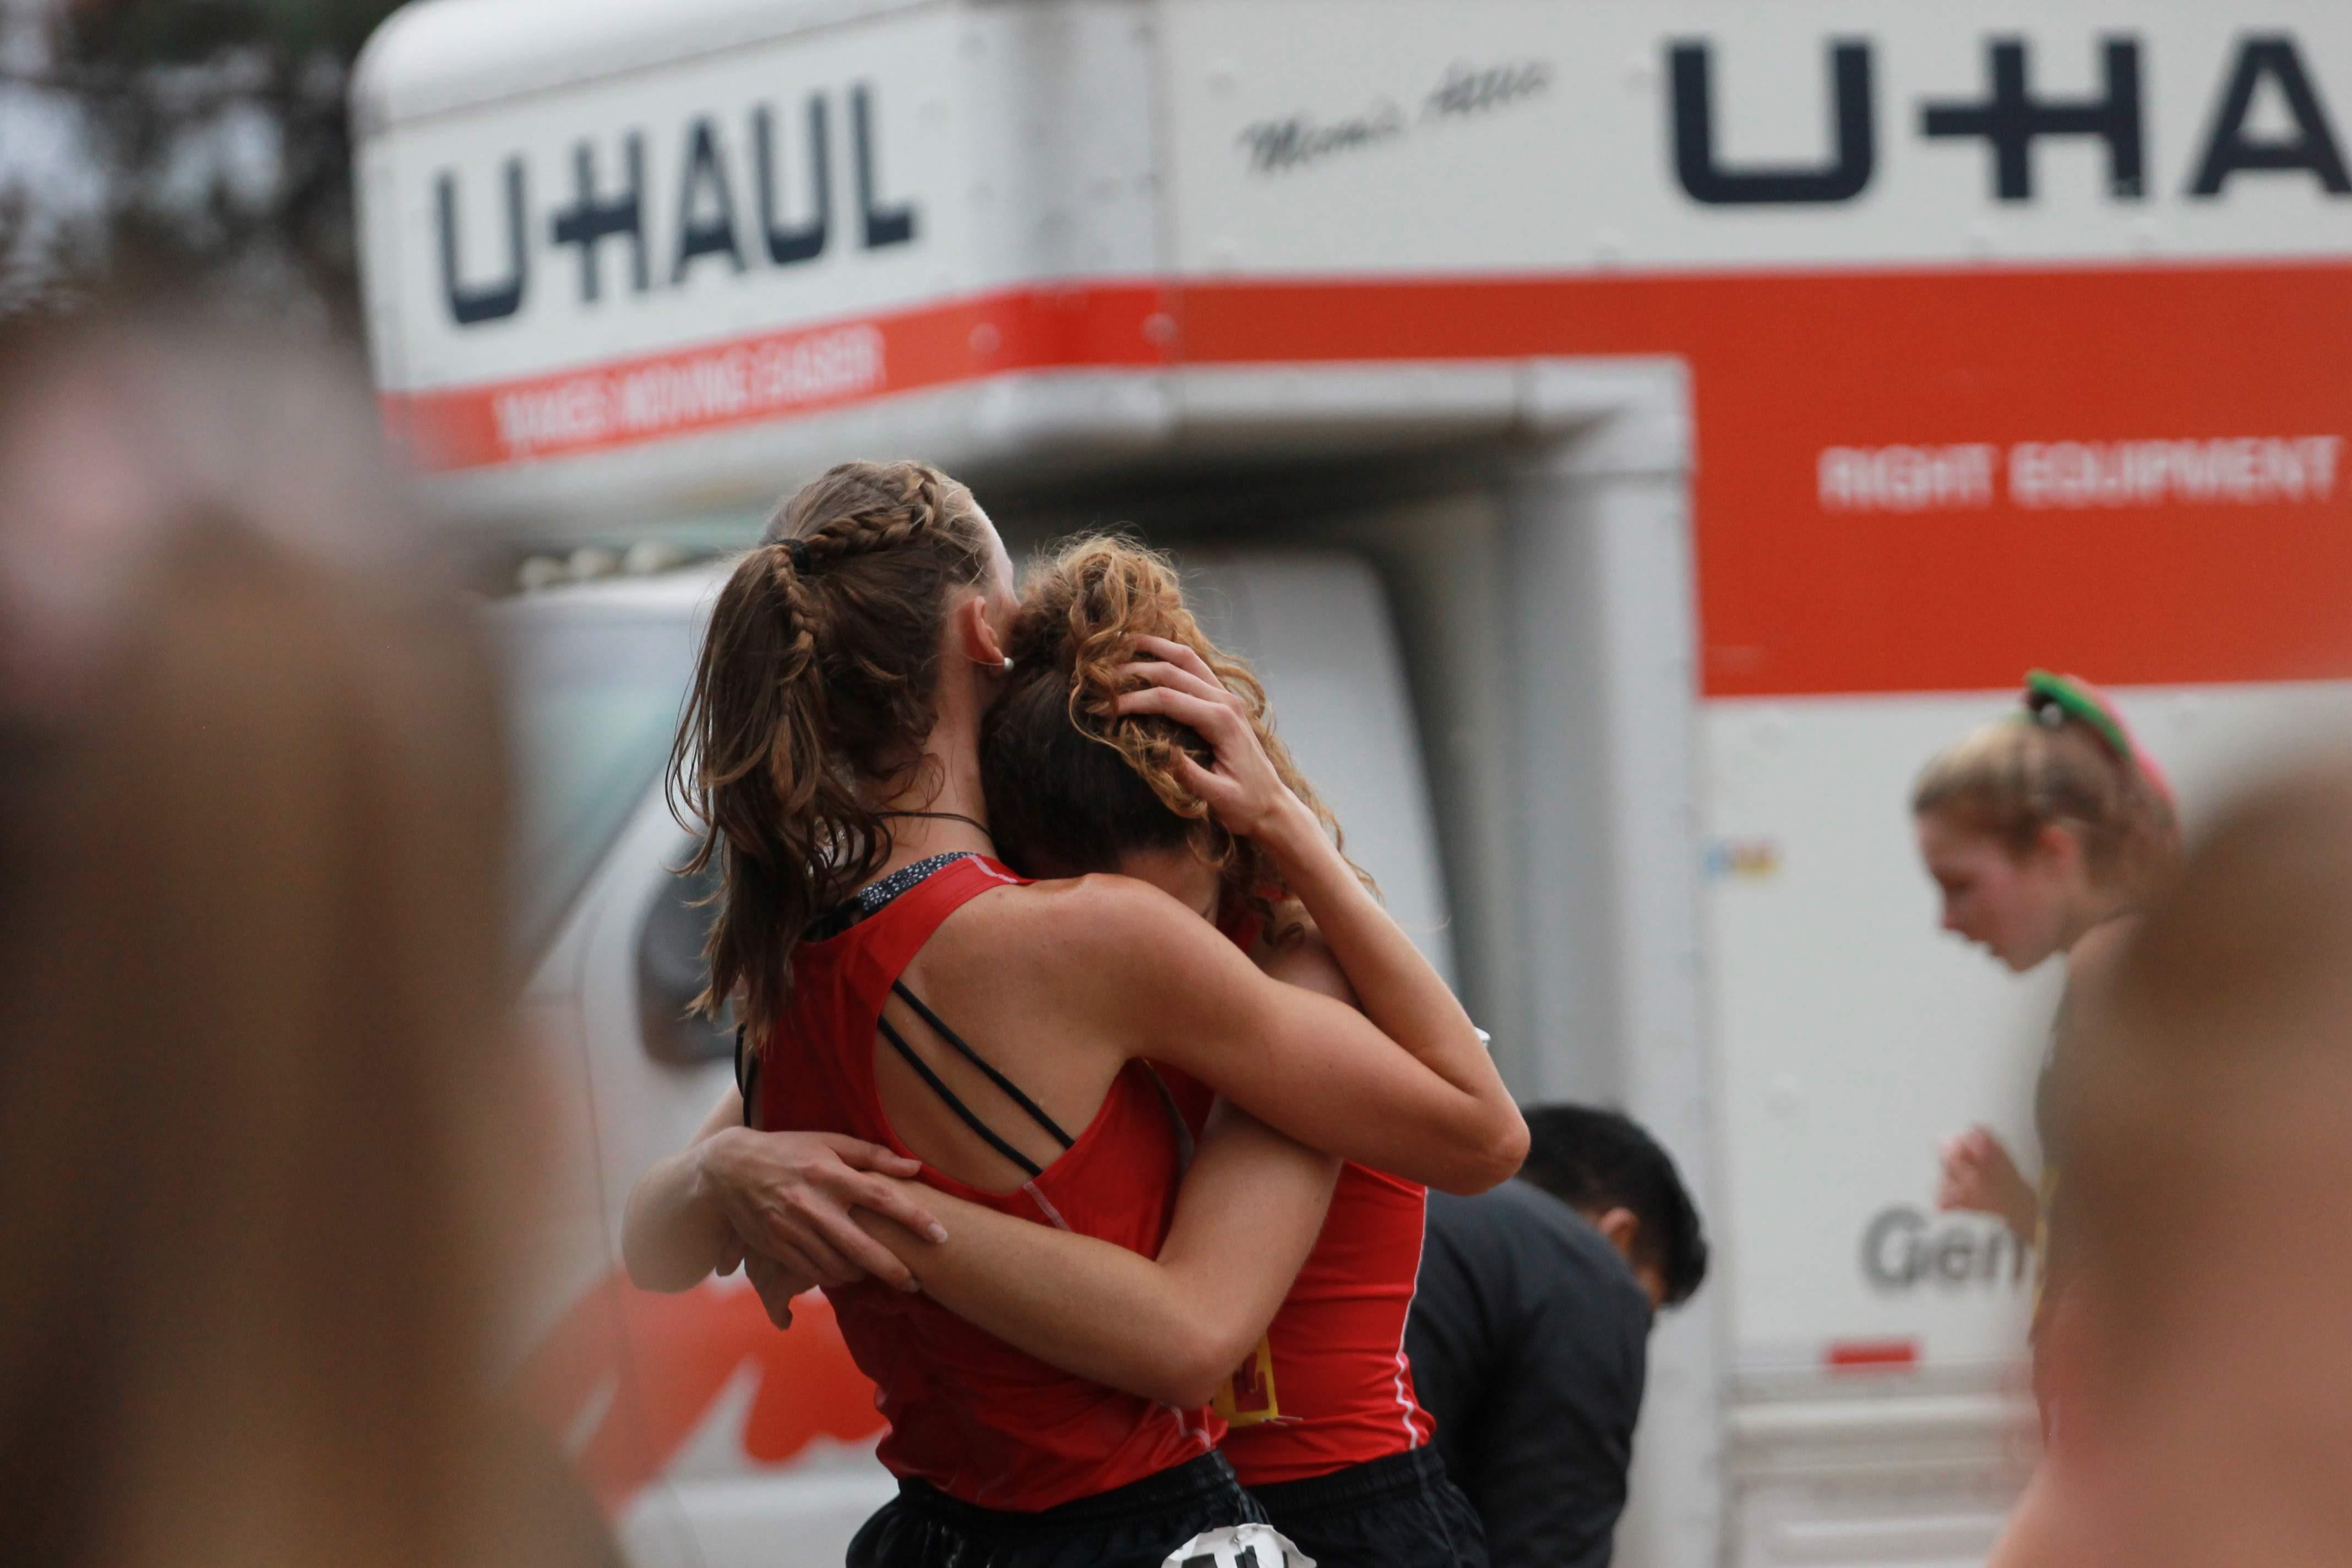 Lauren Kearney and Brooke Secreto hug after crossing the finish line. Credit: Jocelyn Brossia / The Foothill Dragon Press